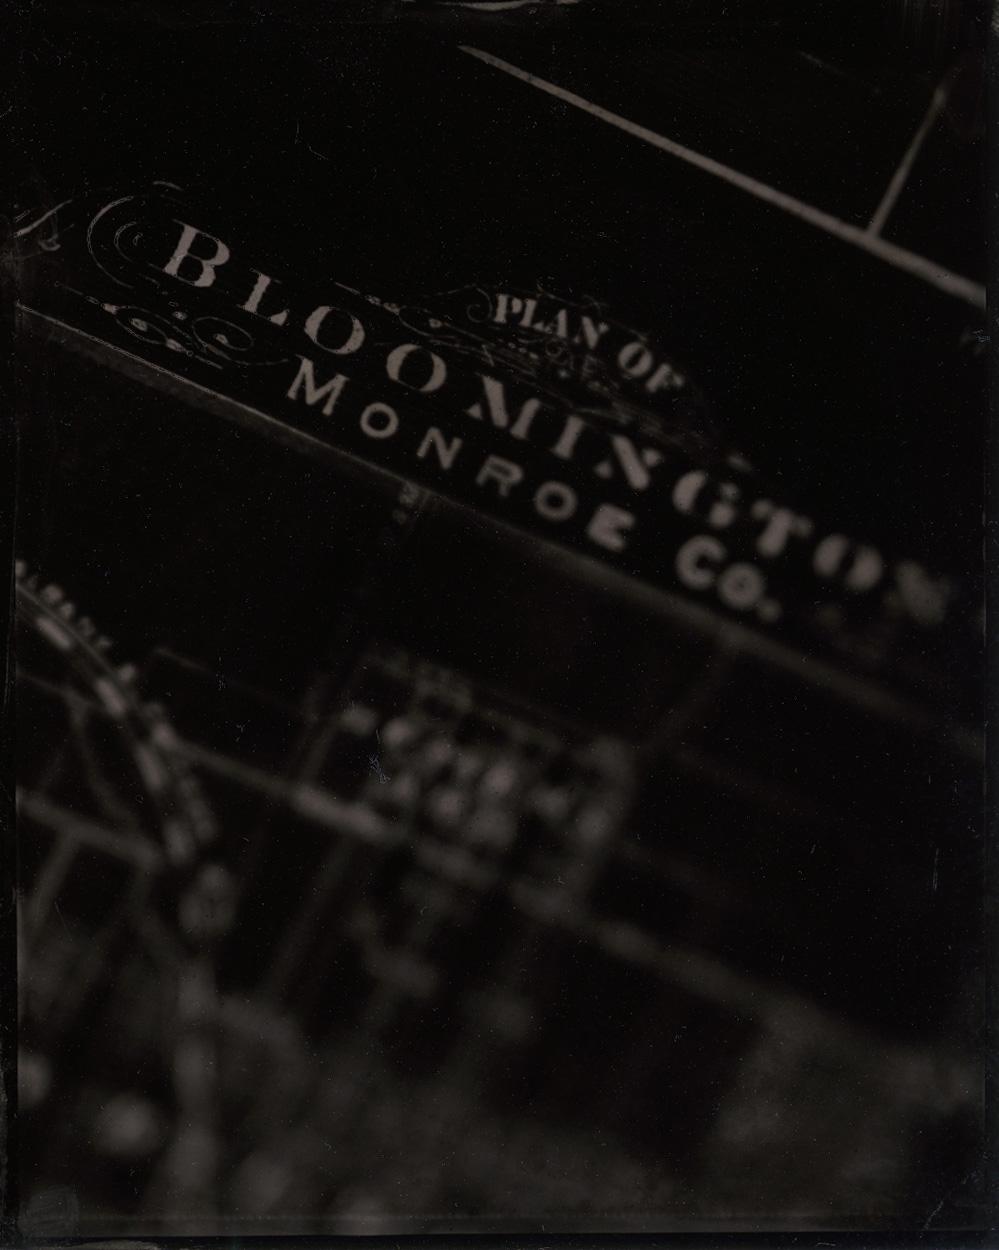 12-ClayRoadMap-4x5tintype-BloomingtonIN.jpg